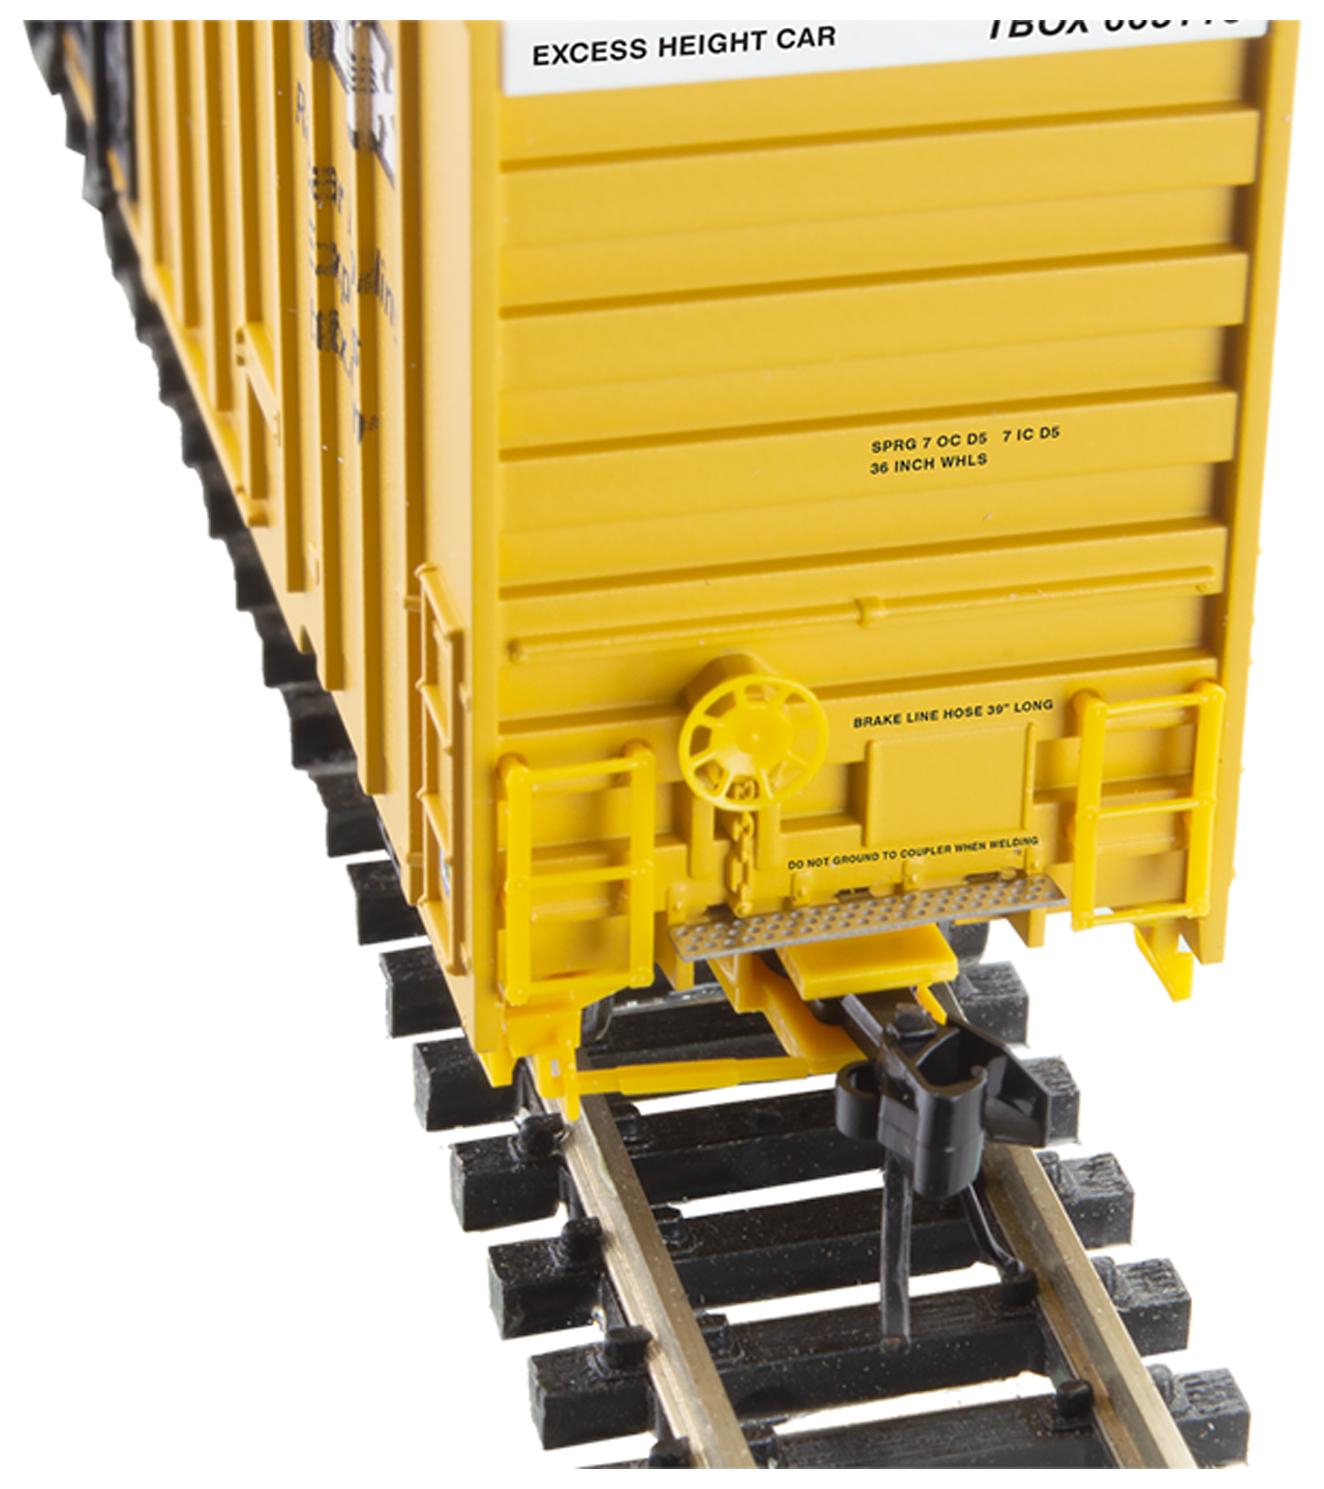 N Scale - Micro-Trains - 123 53 010 - Boxcar, 60 Foot, NSC Excess Height - RailBox - 665141